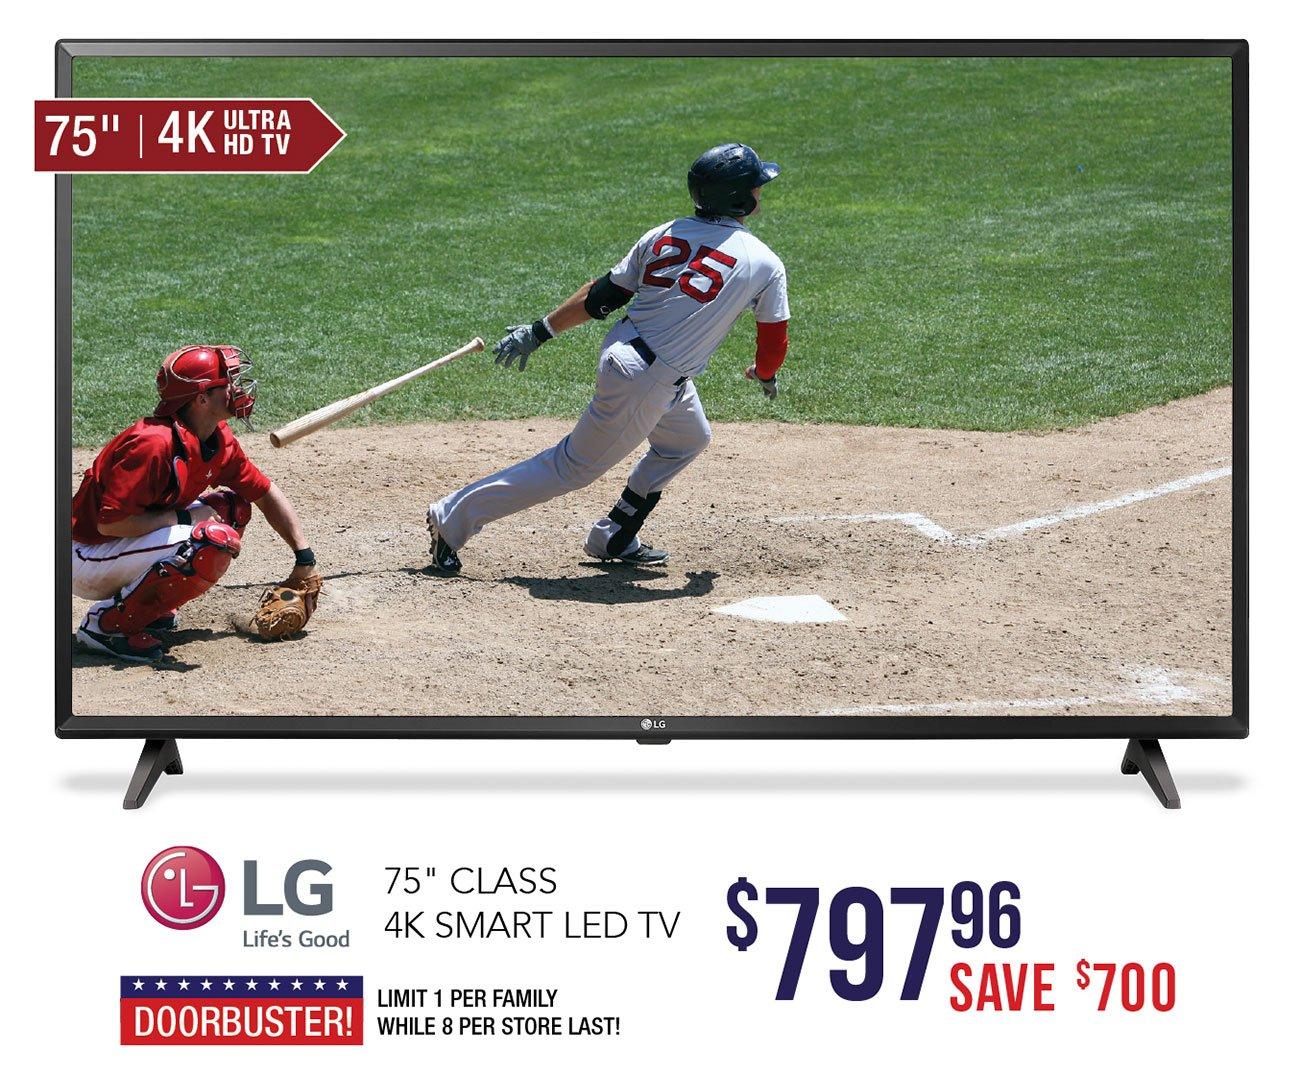 LG-75-inch-led-TV